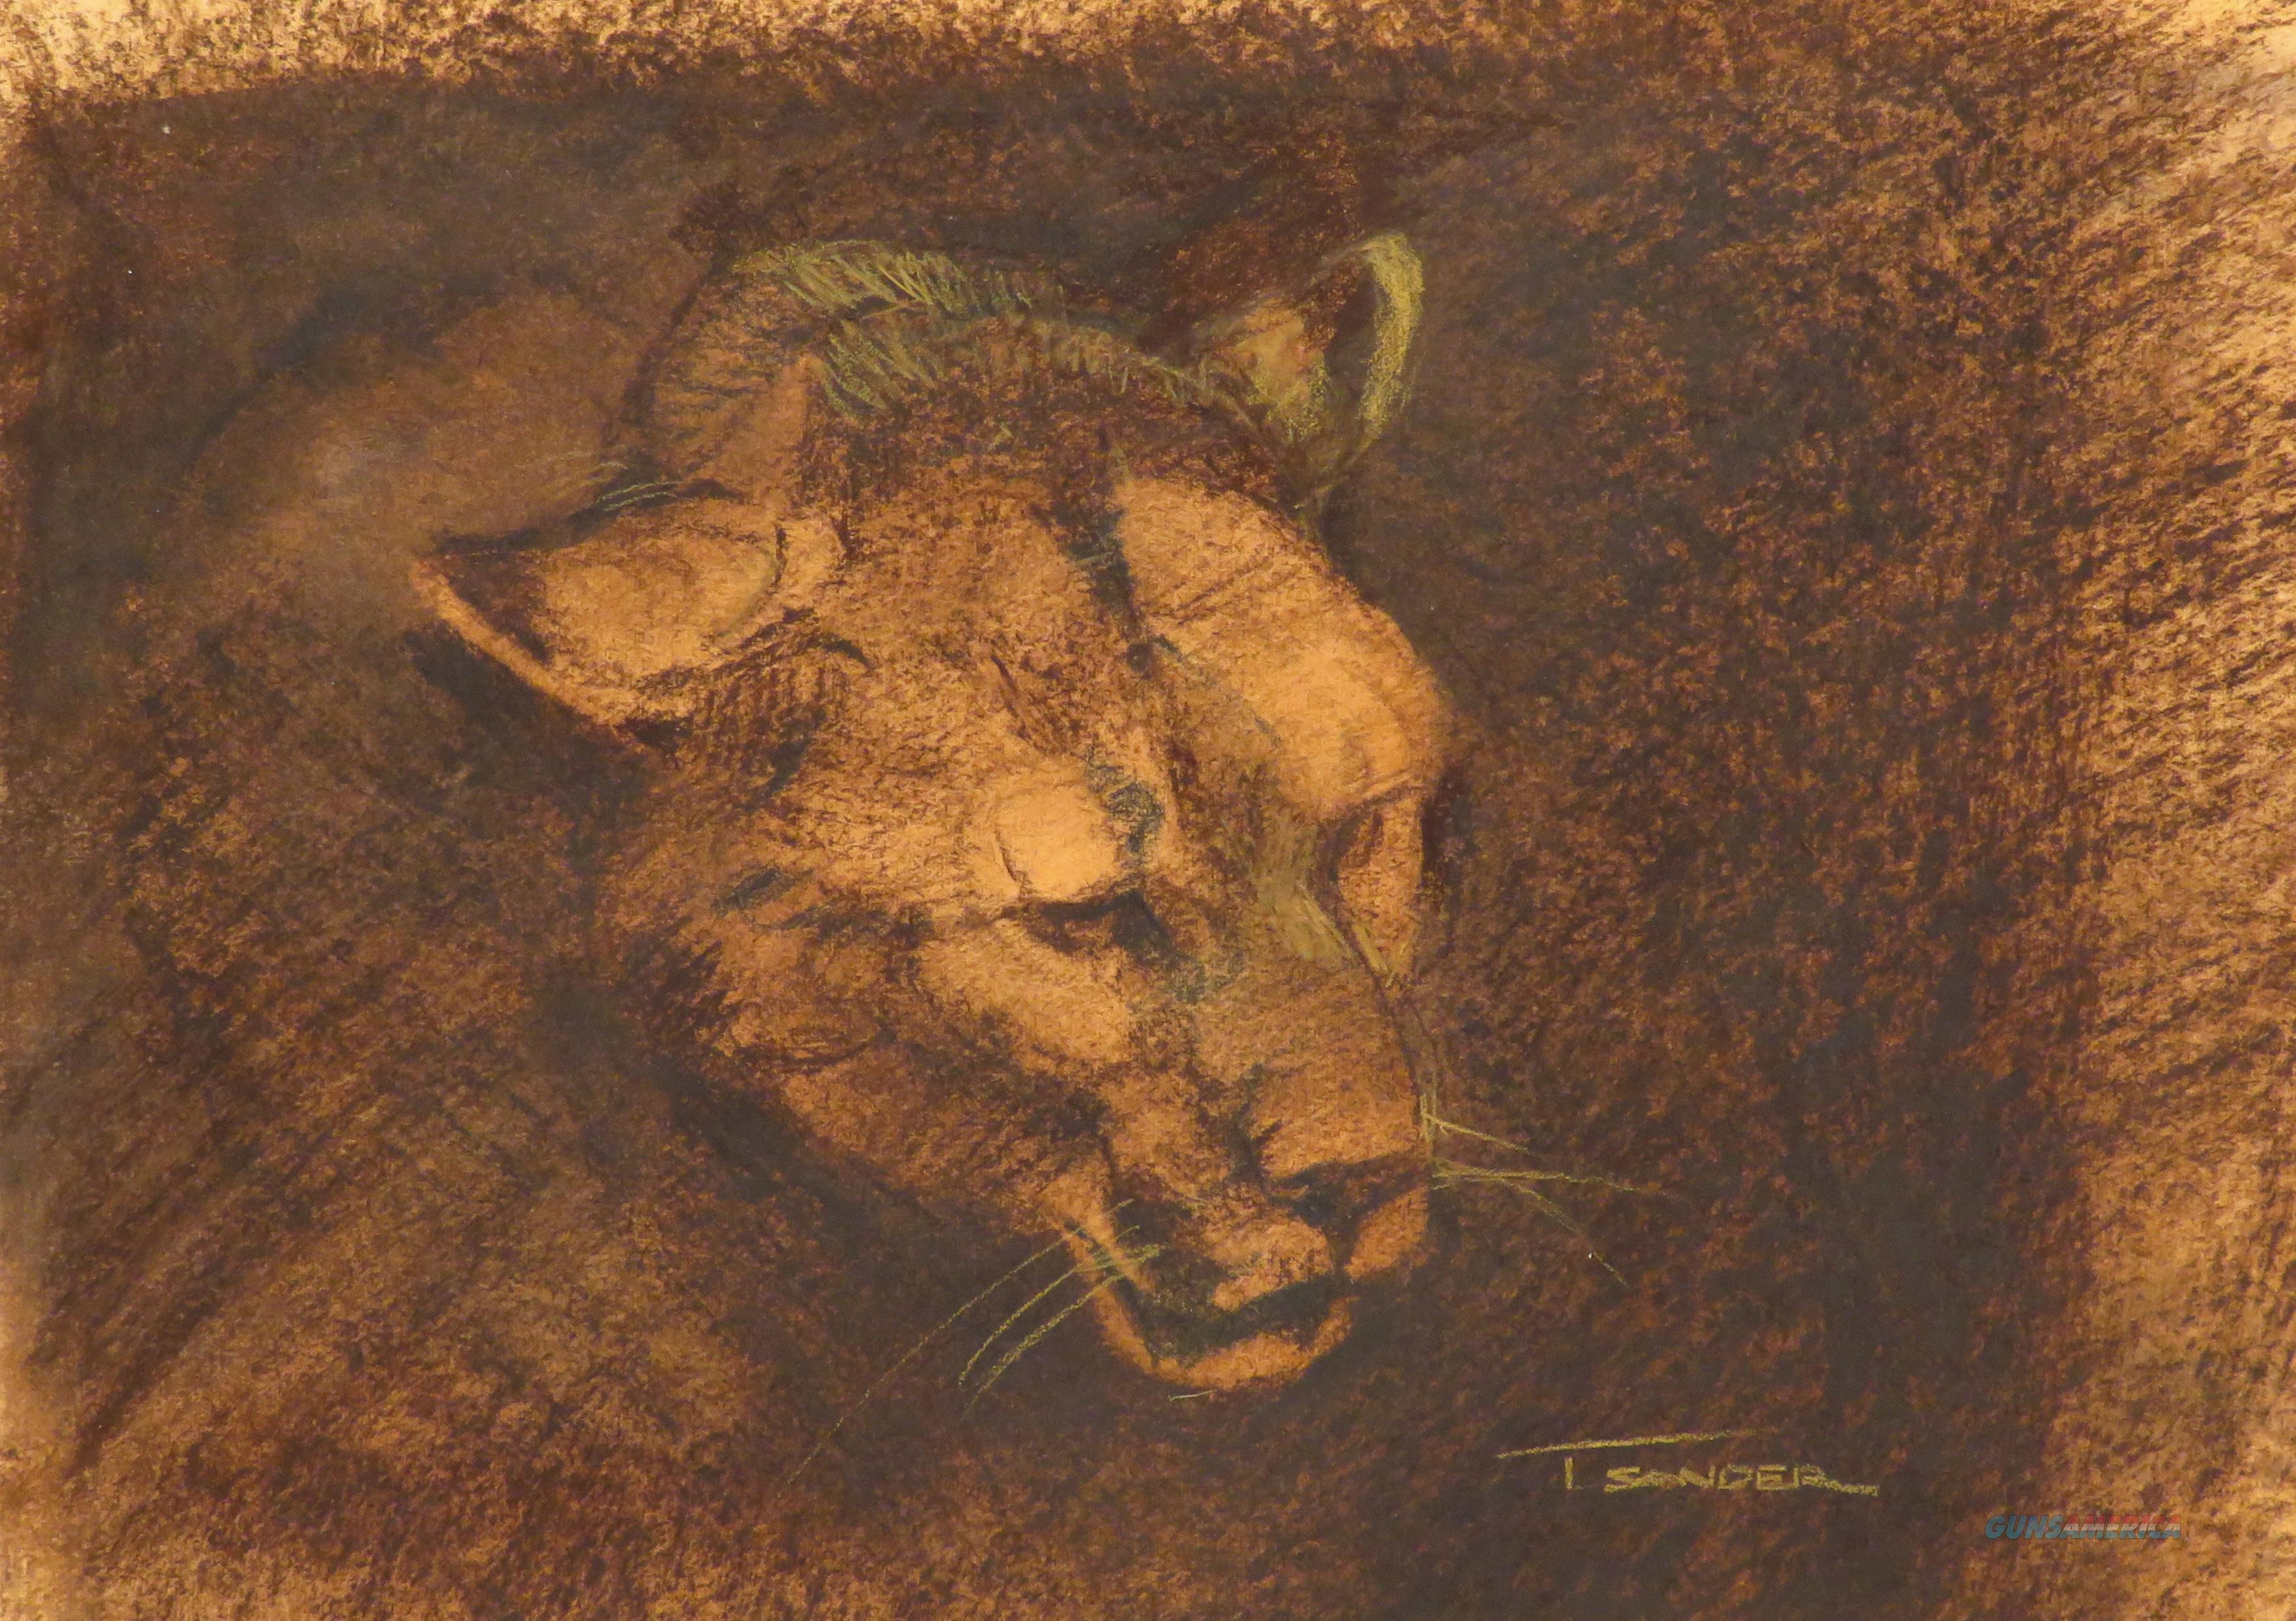 Tom Sander original pencil sketch, cougar, 10x12 inches live area  Non-Guns > Artwork